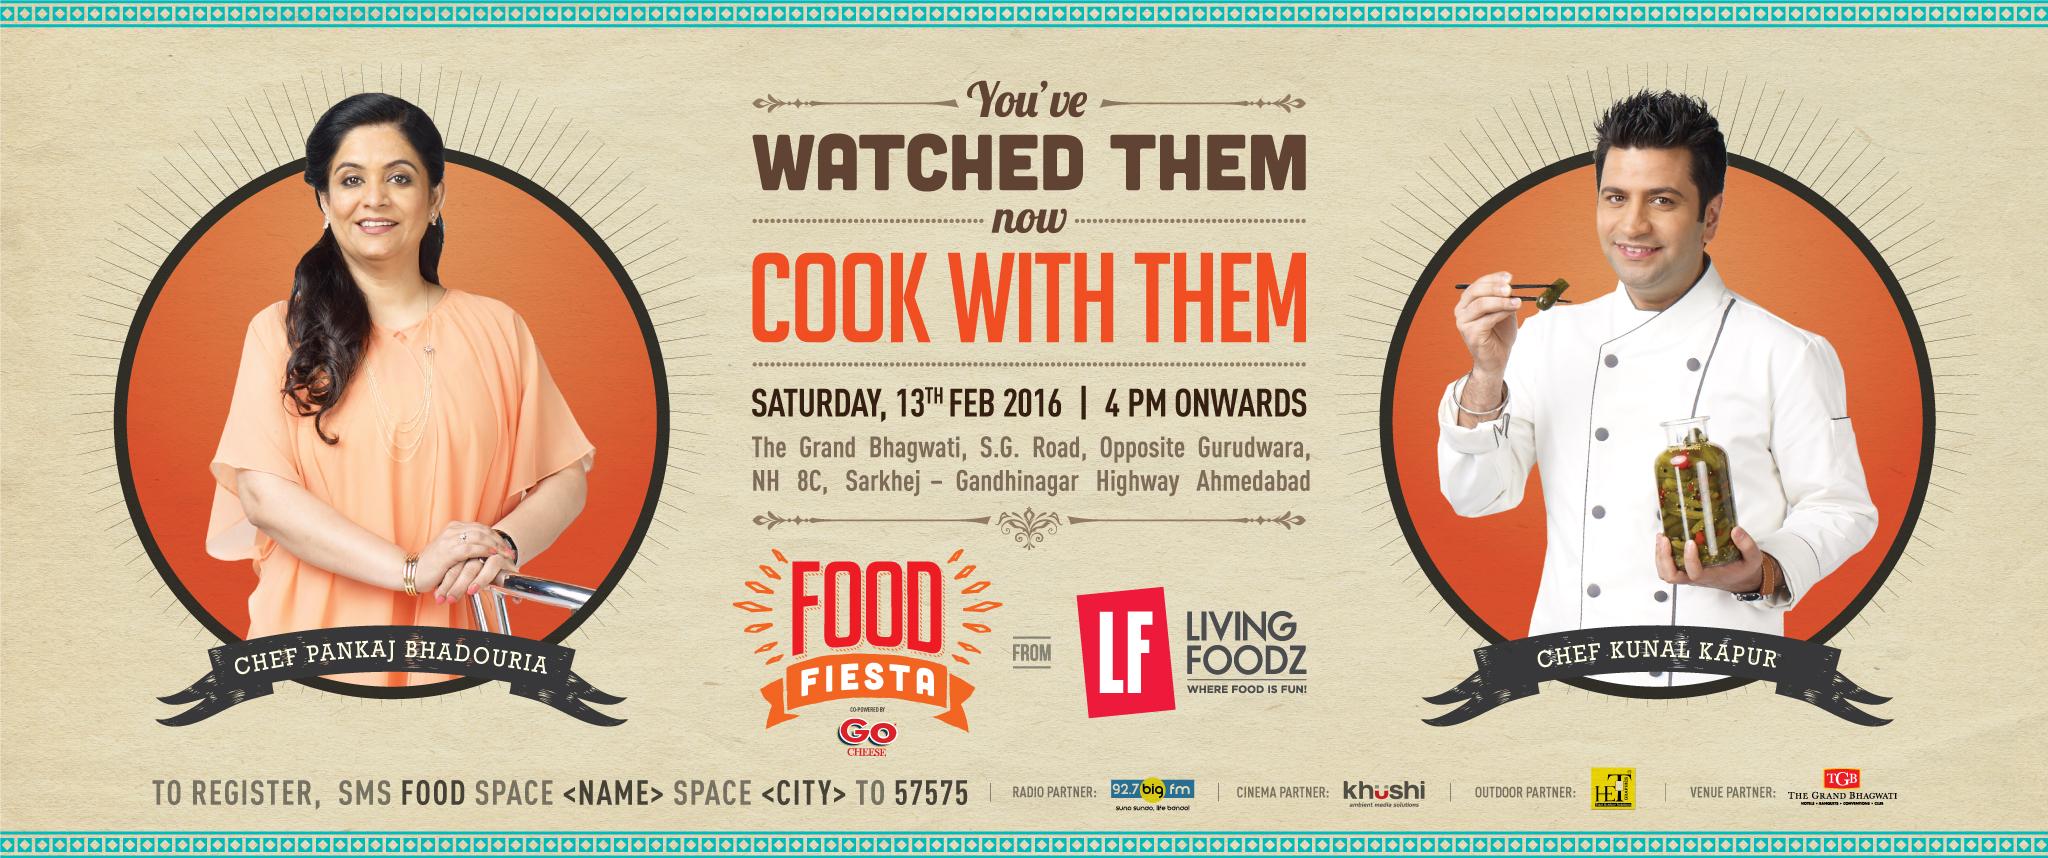 Food Fiesta from Living Foodz Ahmedabad Copy Copy